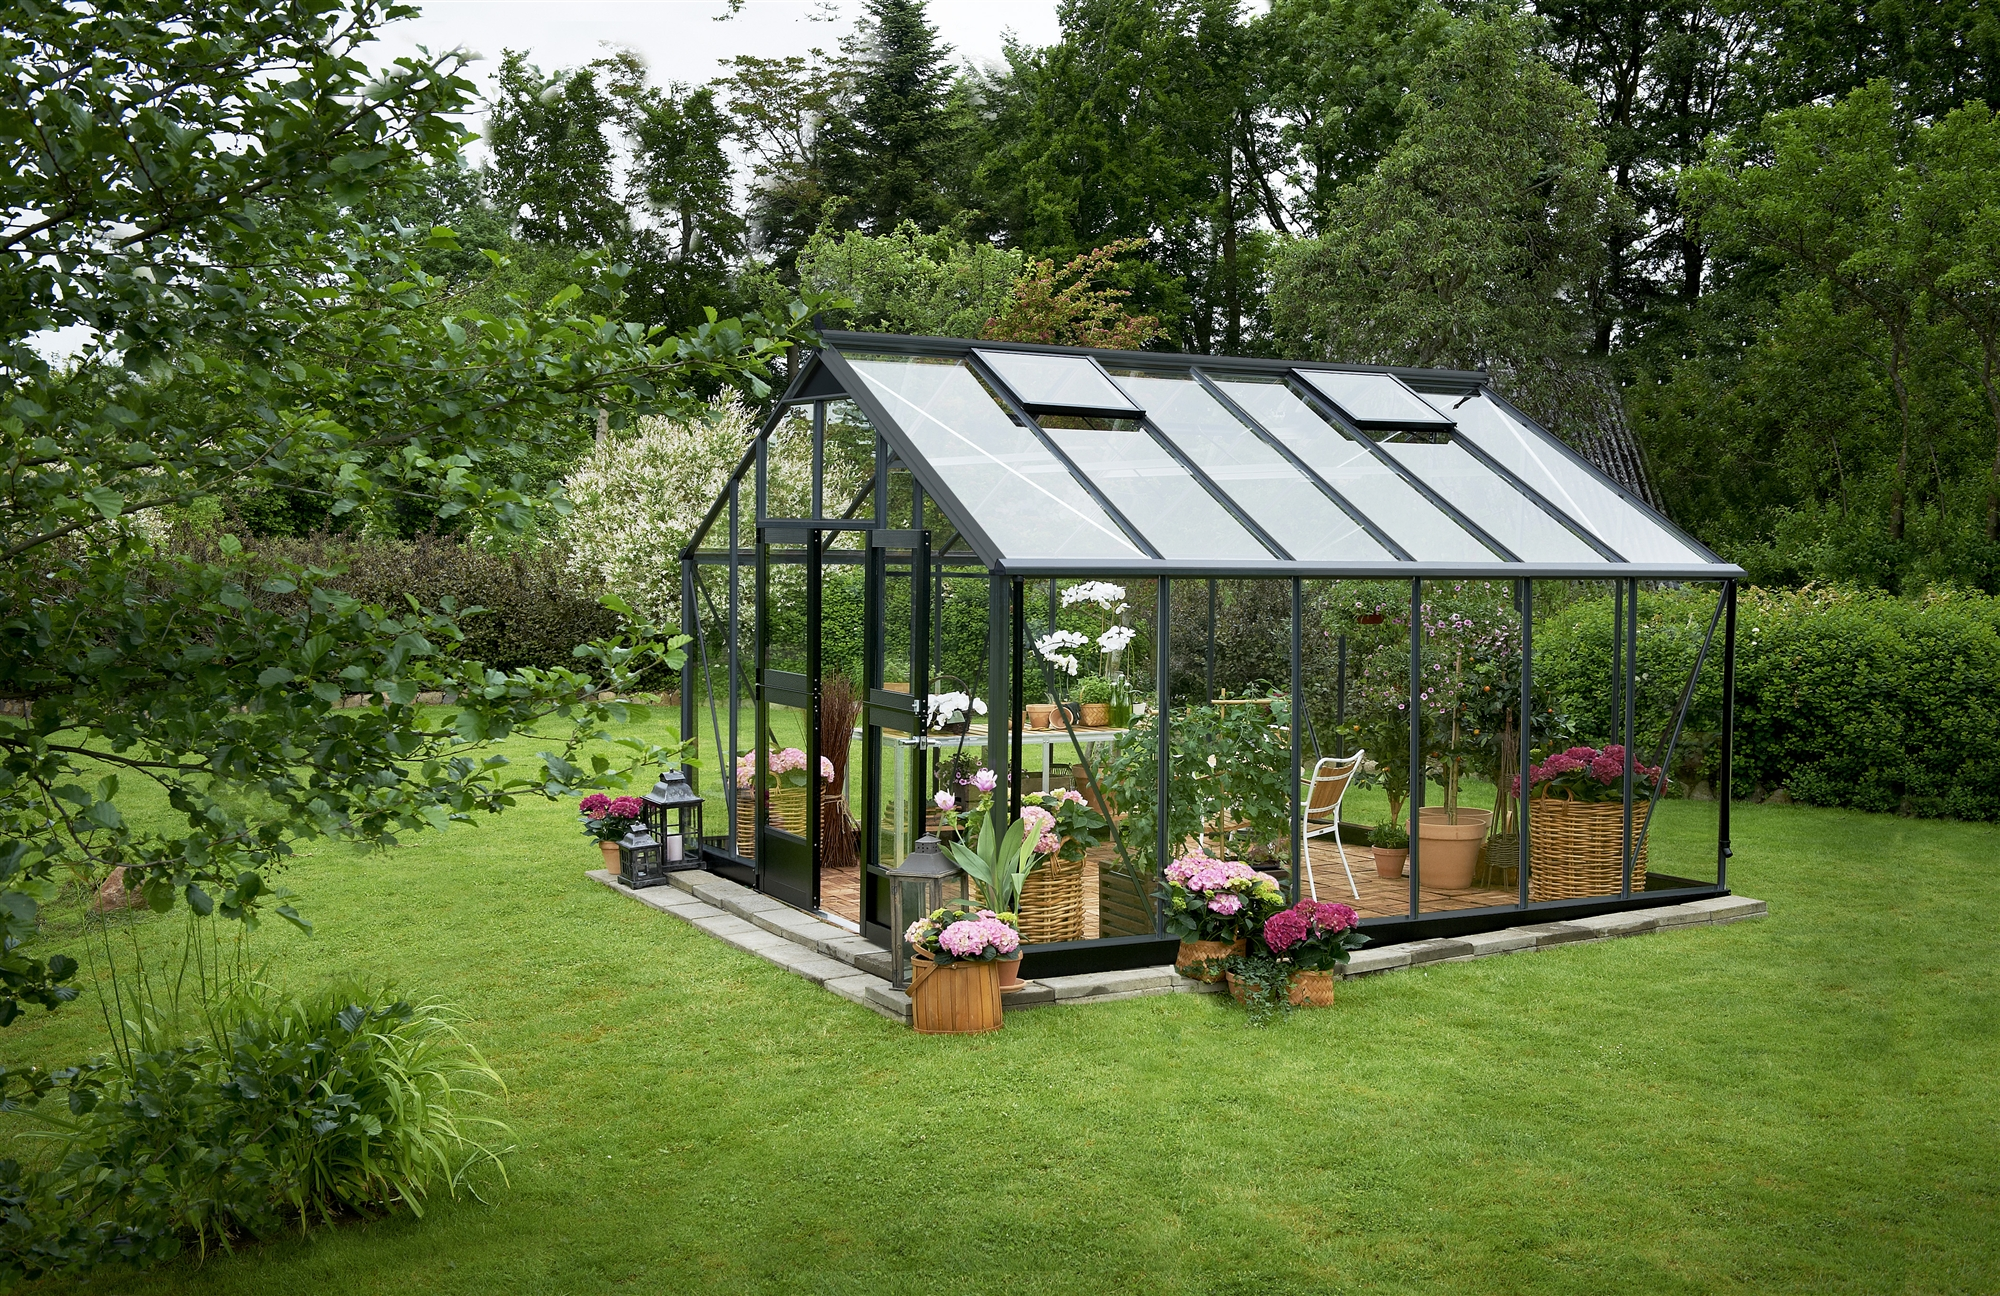 Serre de jardin juliana gartner 16 1m2 anthracite verre tremp for Jardin 1m2